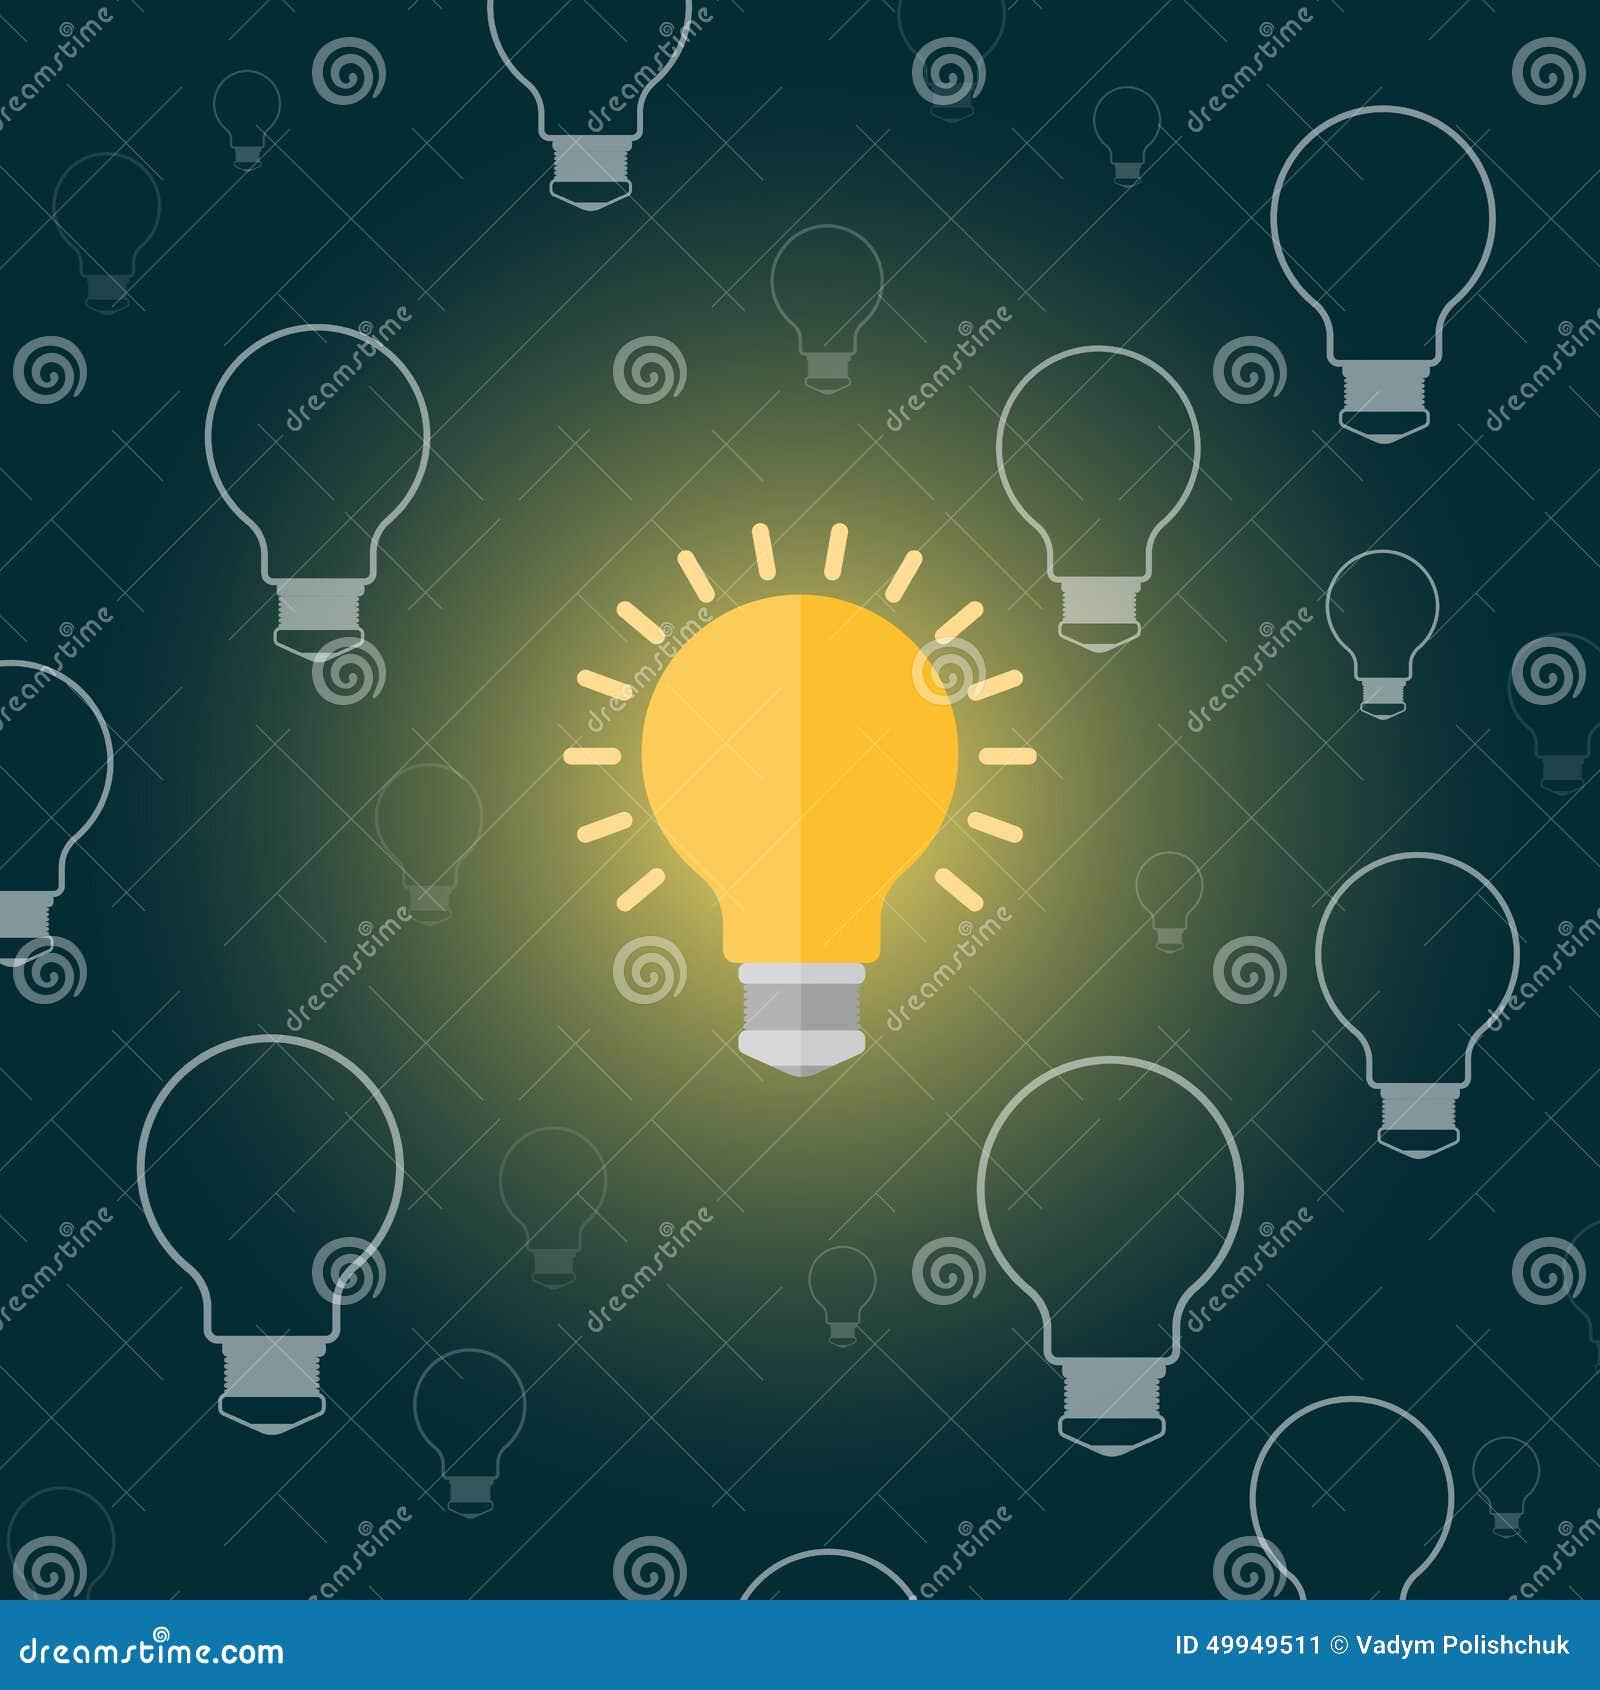 Light Bulb Wallpaper: Light Bulb In A Cartoon Style Flat On A Dark Background